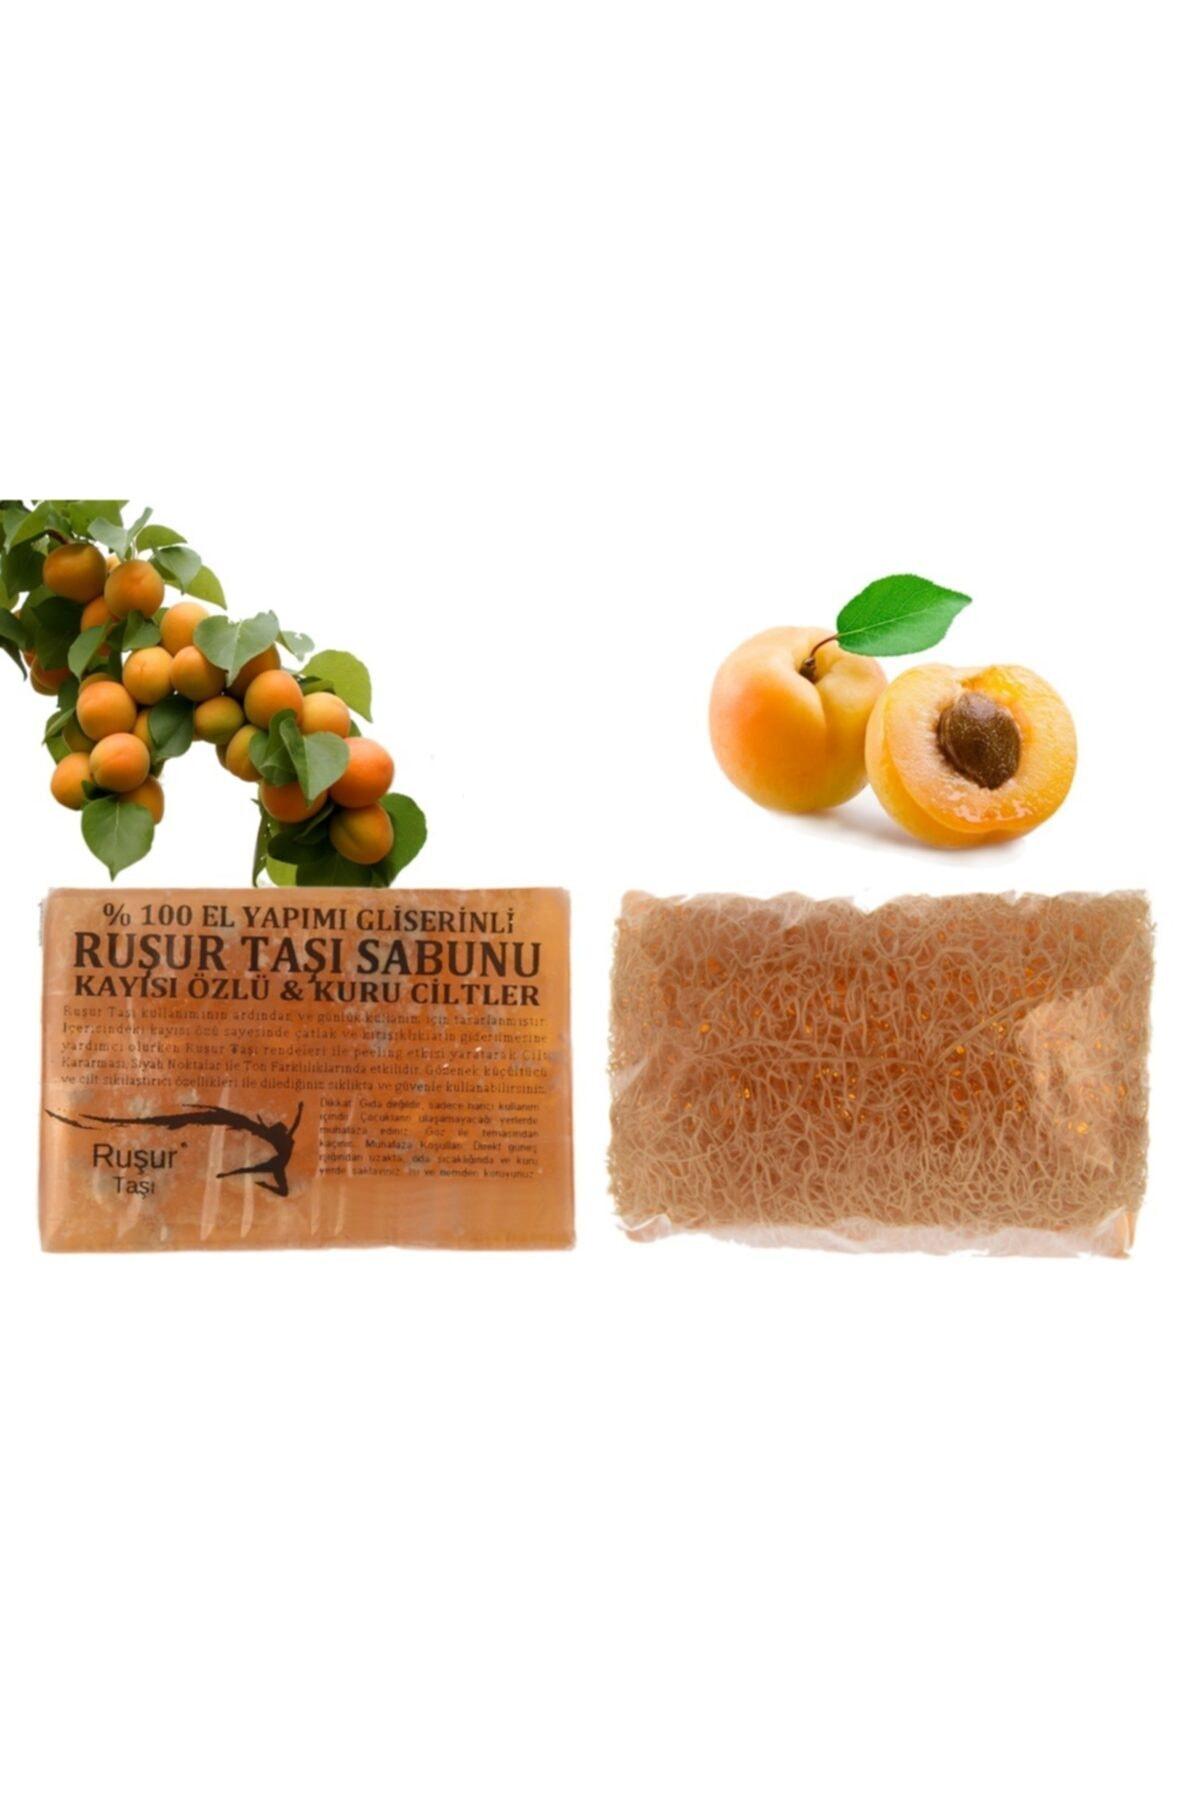 Ruşur Taşı Sabunu Kayısı Özlü Lifli %100 El Yapımı